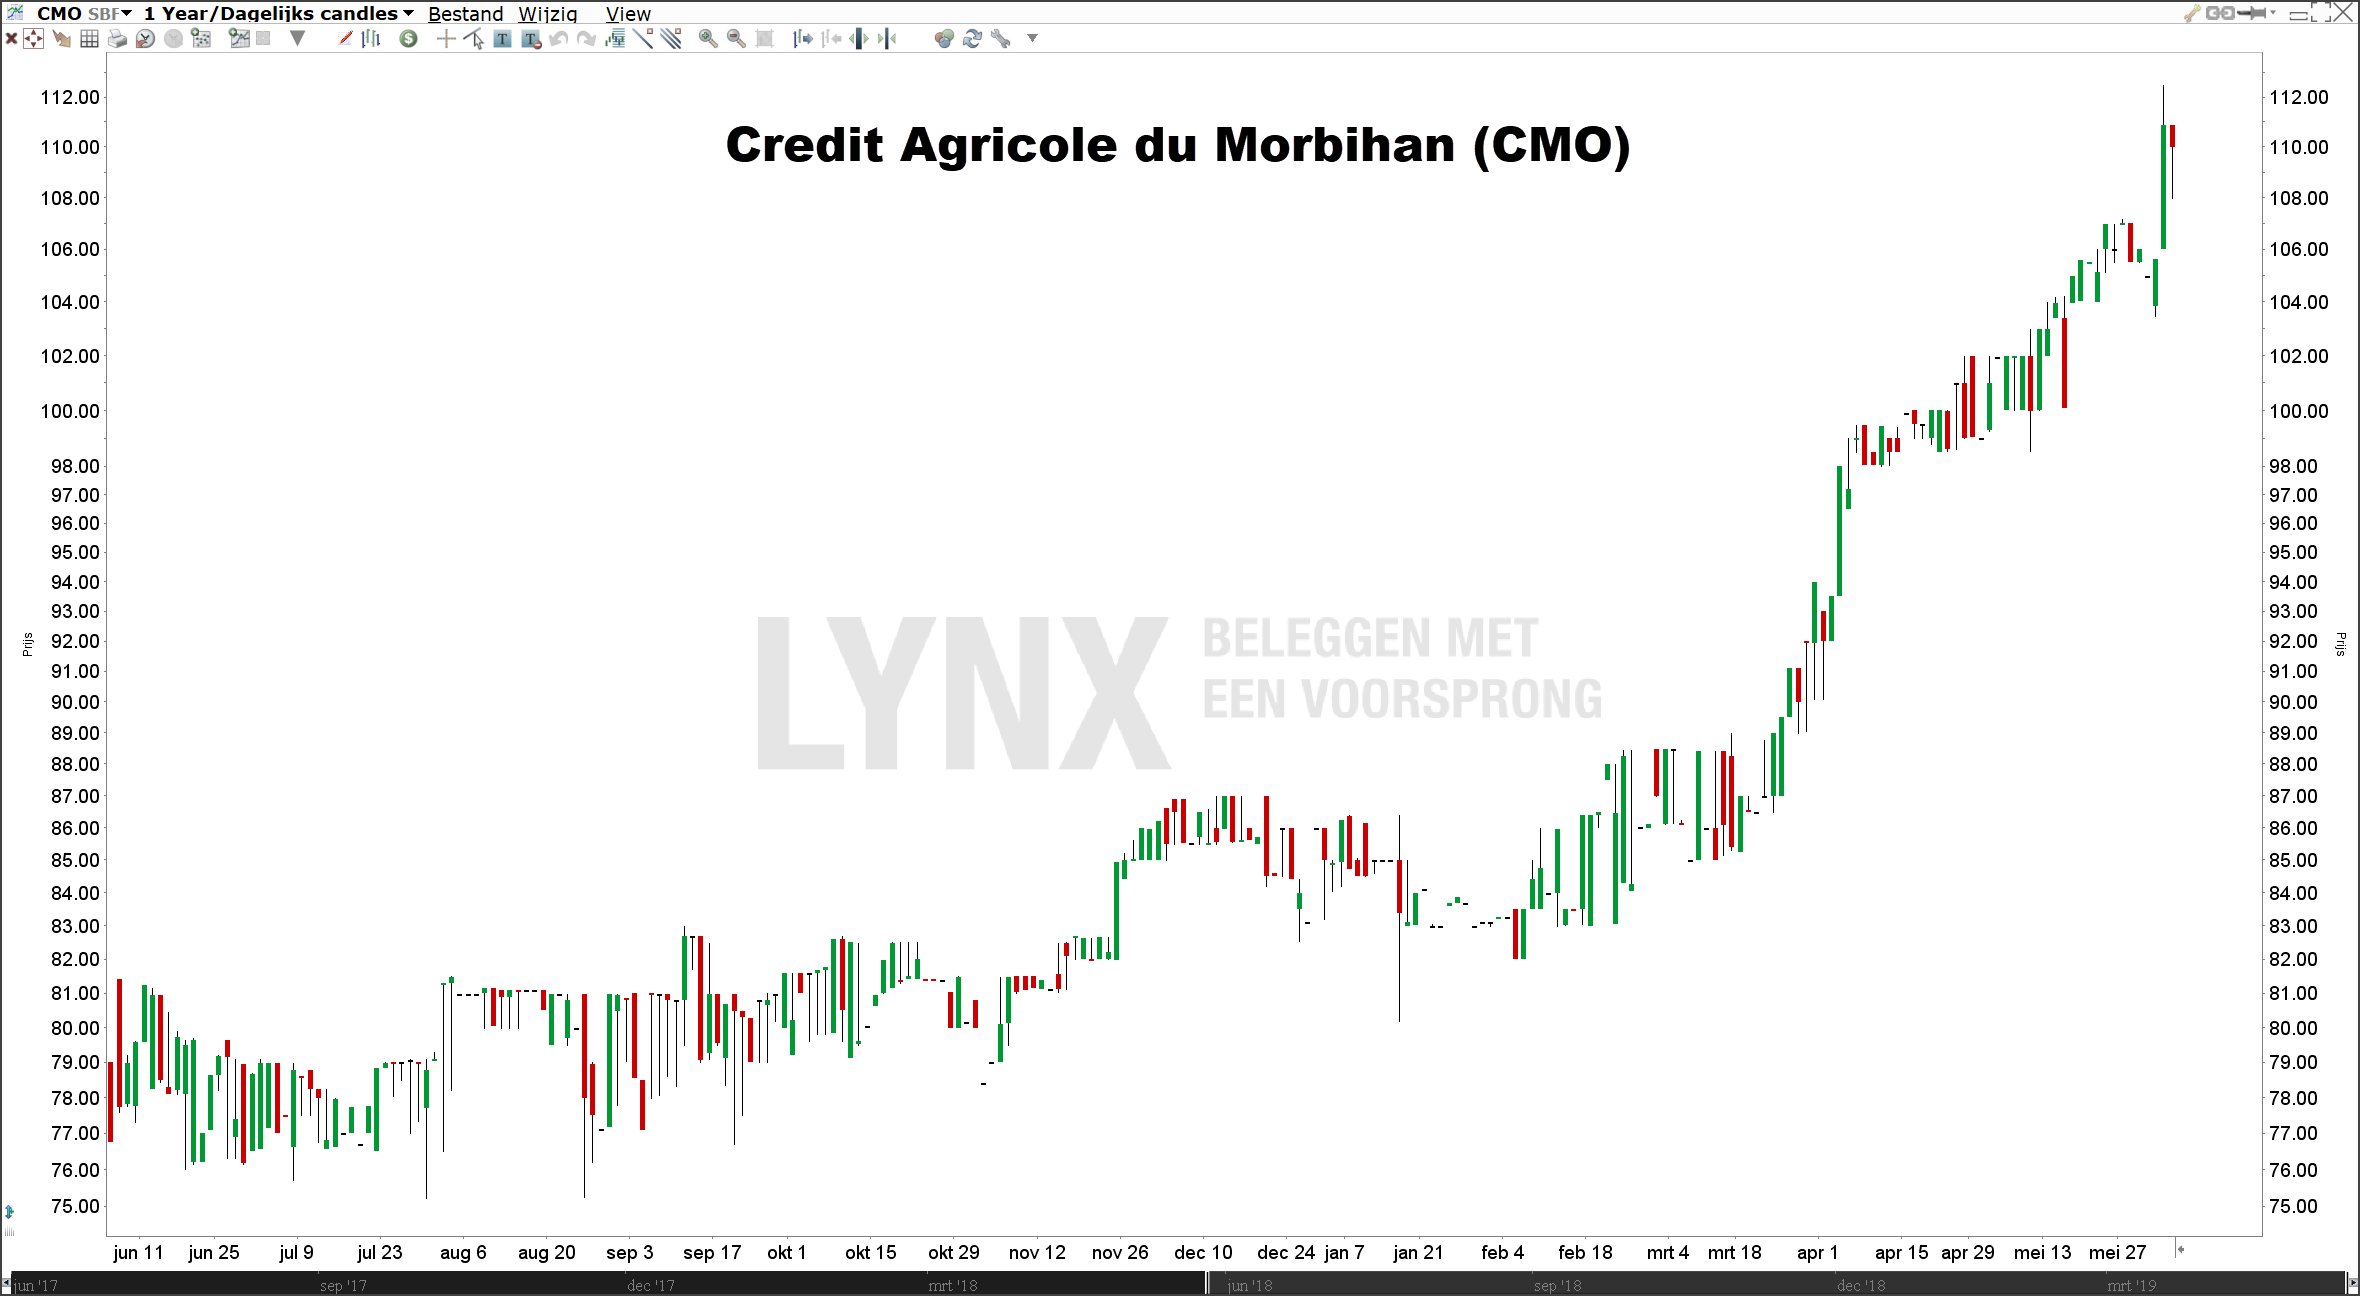 Small cap aandeel Credit Agricole du Morbihan